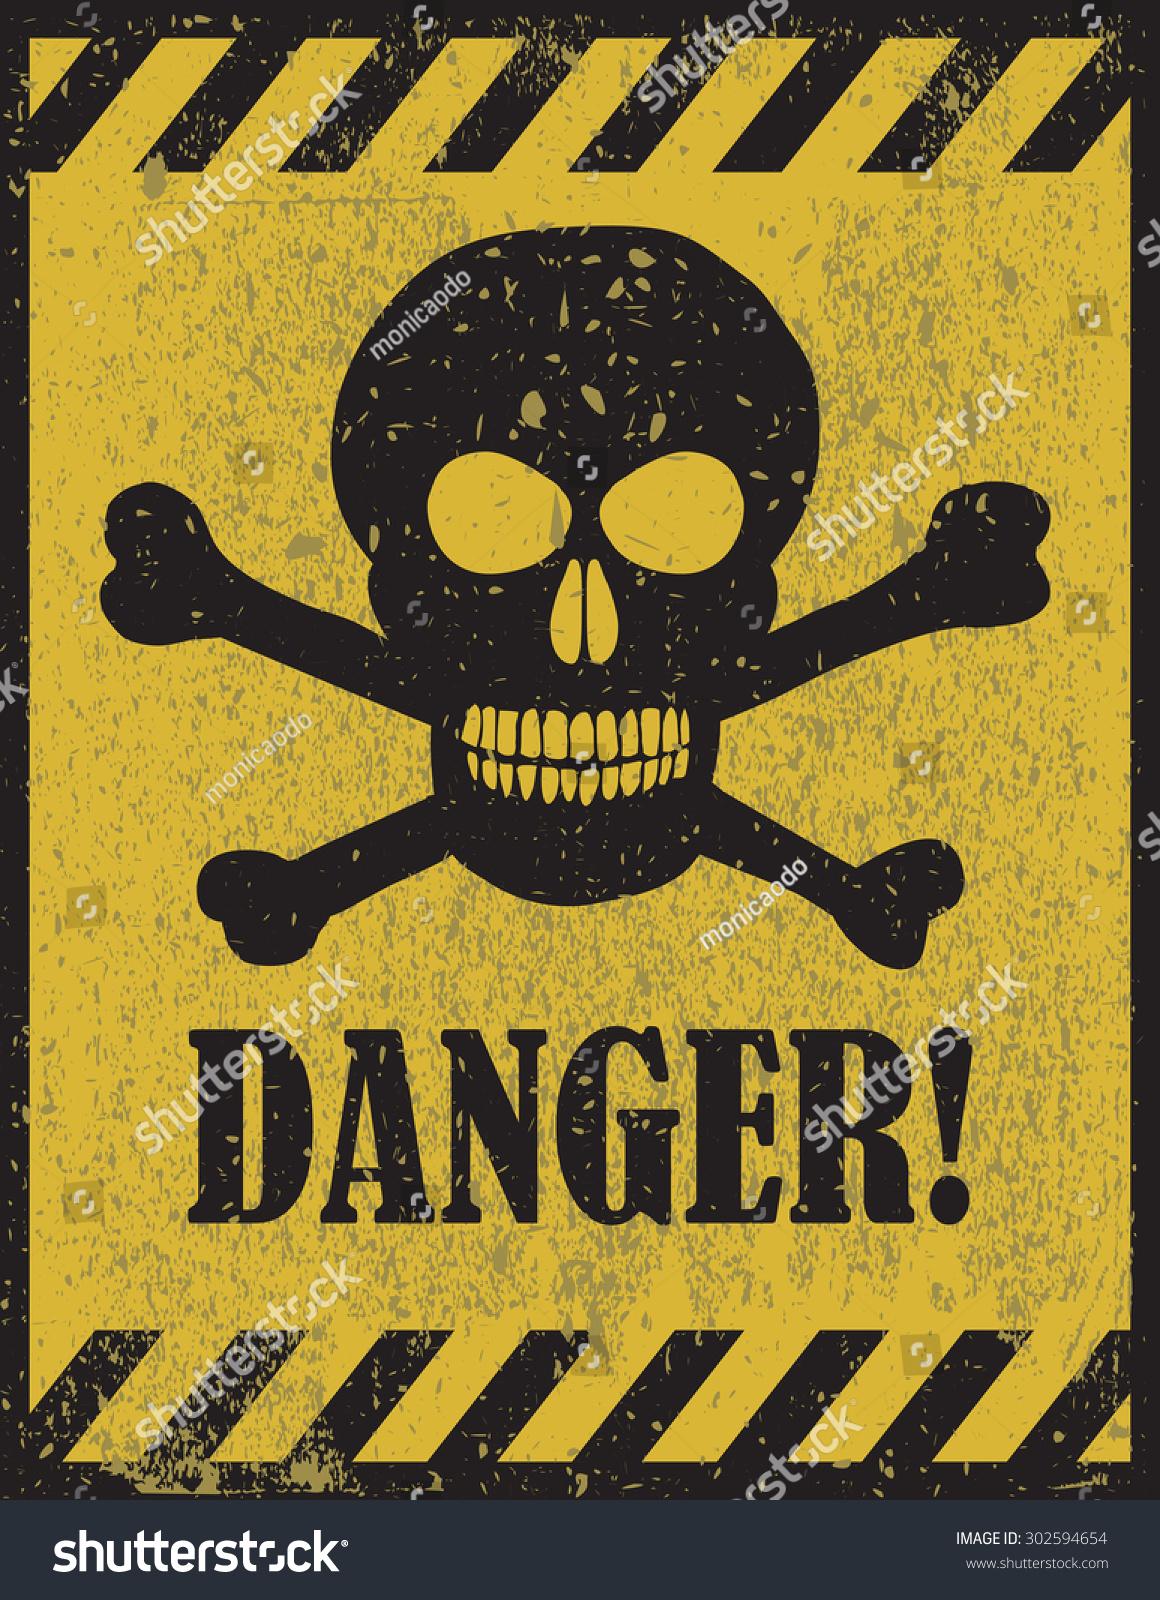 danger zone ダウンロード